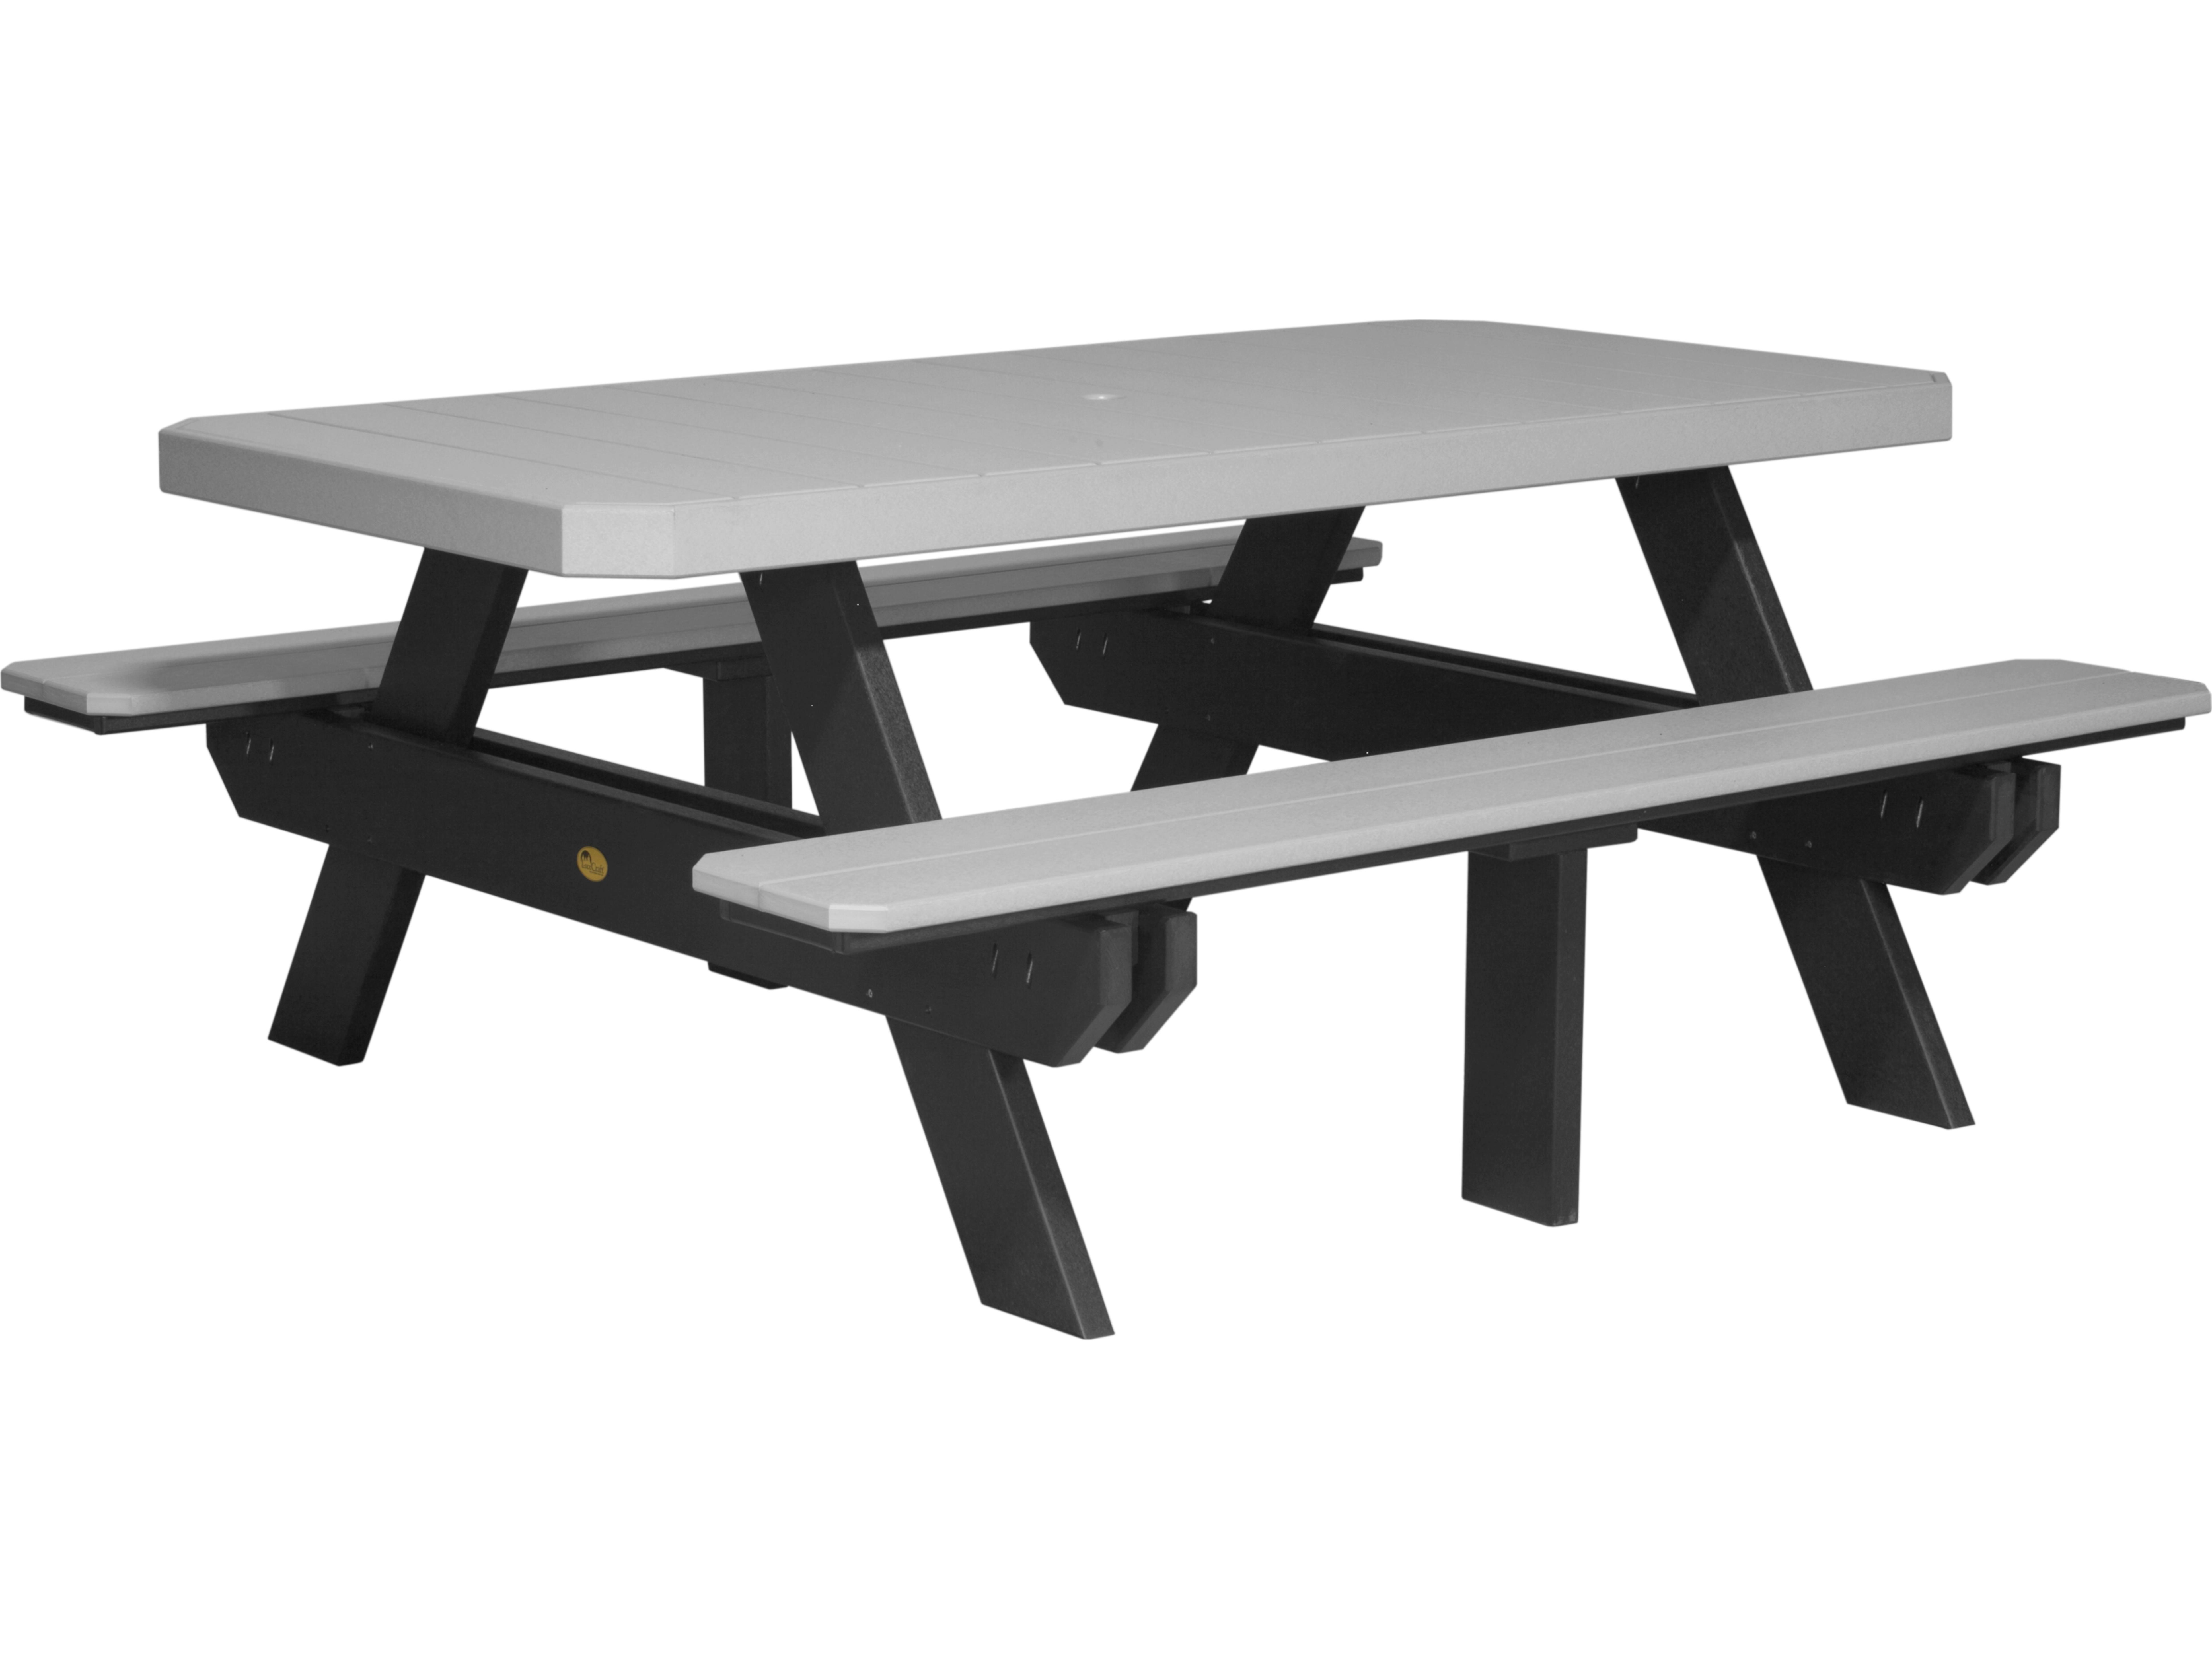 Sensational Luxcraft Recycled Plastic 73 5 X 64 Rectangular Picnic Table Download Free Architecture Designs Oxytwazosbritishbridgeorg